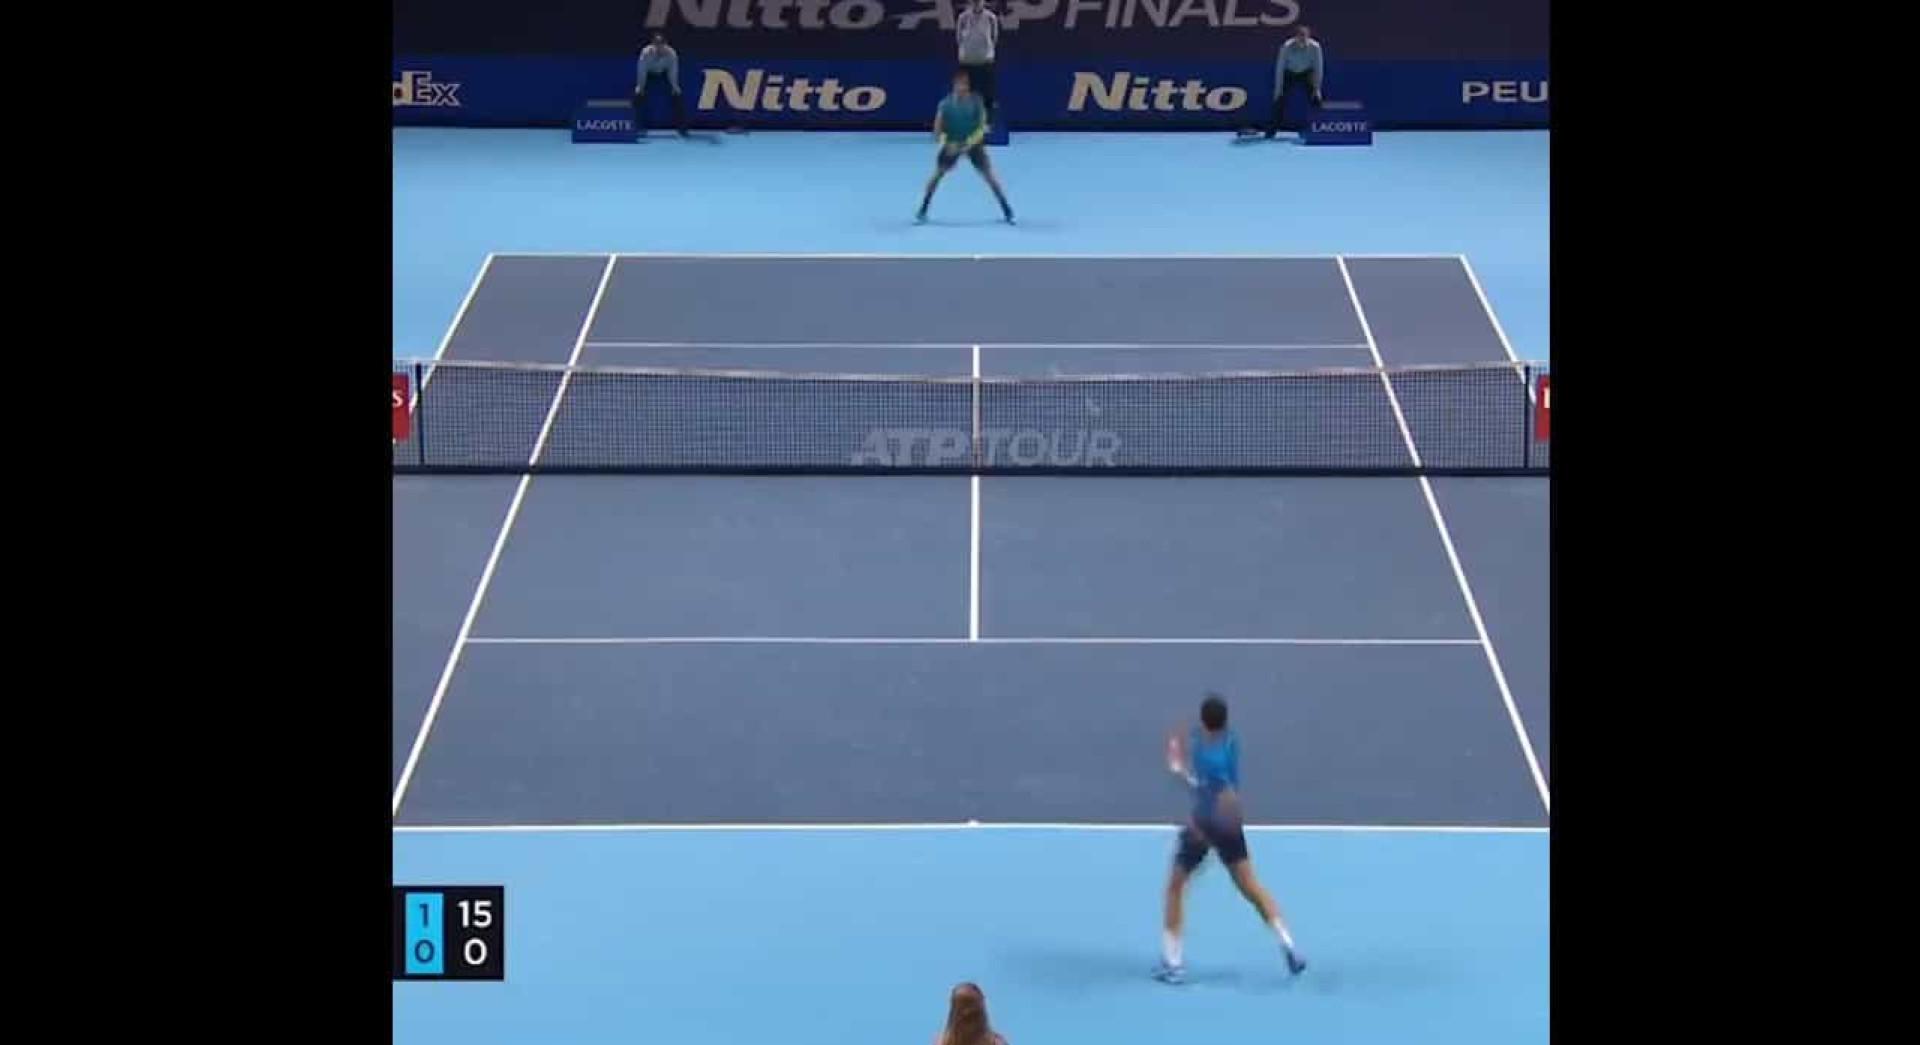 Até Djokovic aplaudiu este ponto monstruoso de Berrettini